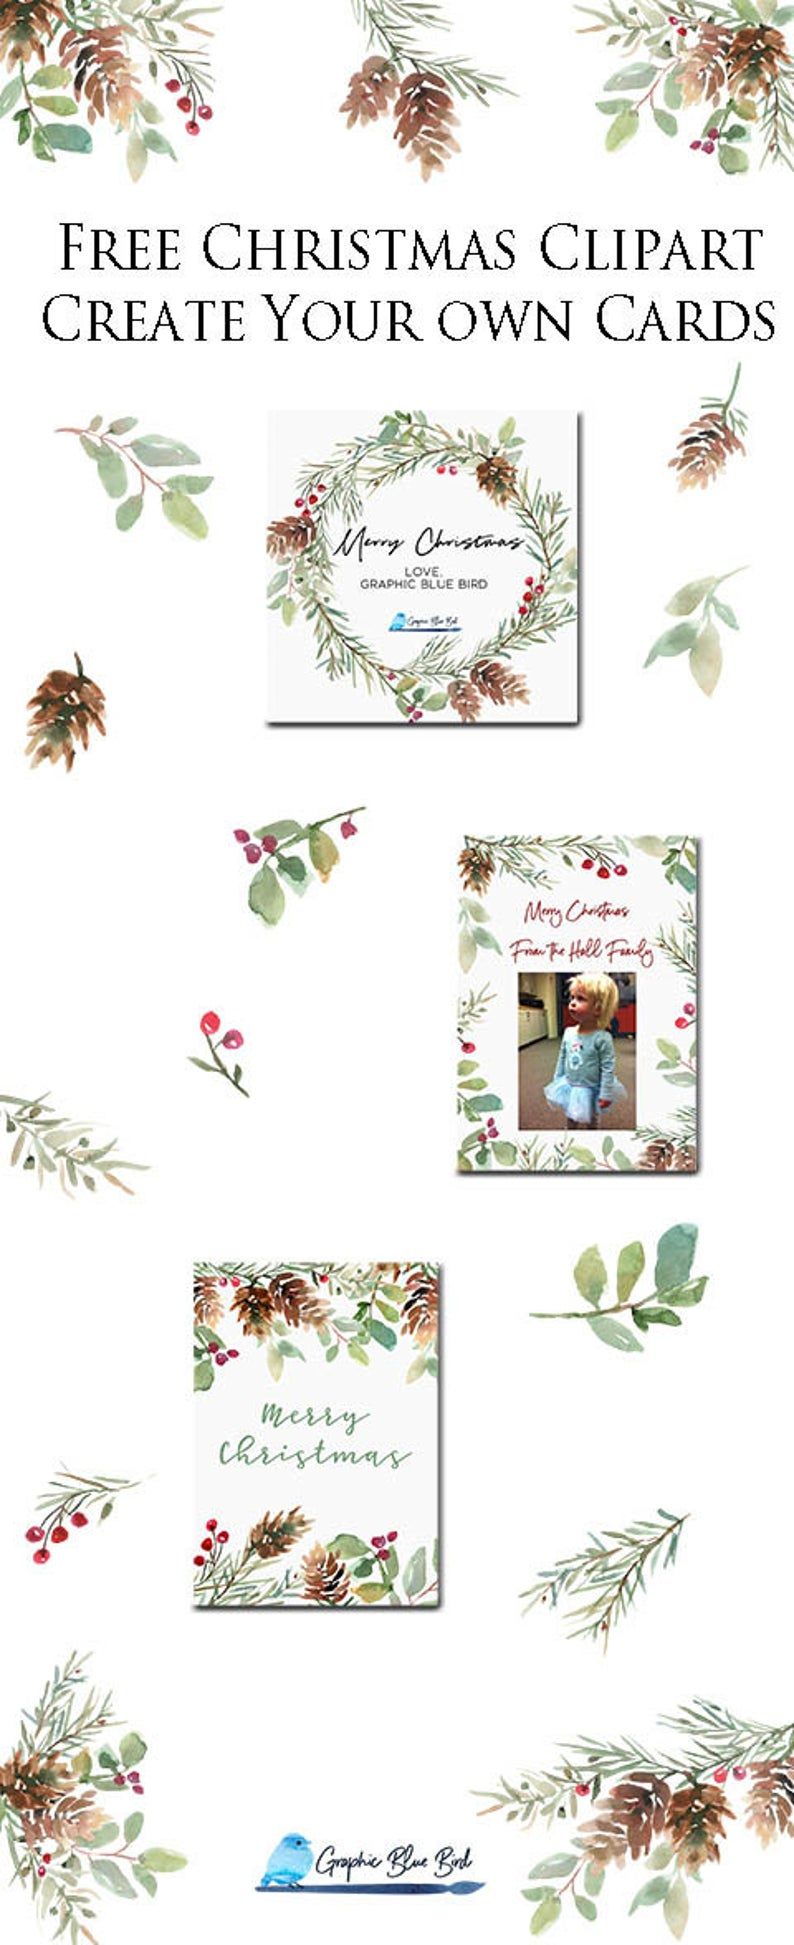 Christmas Watercolor Greenery Free Watercolor Clipart Etsy In 2020 Christmas Watercolor Christmas Card Templates Free Christmas Cards Free